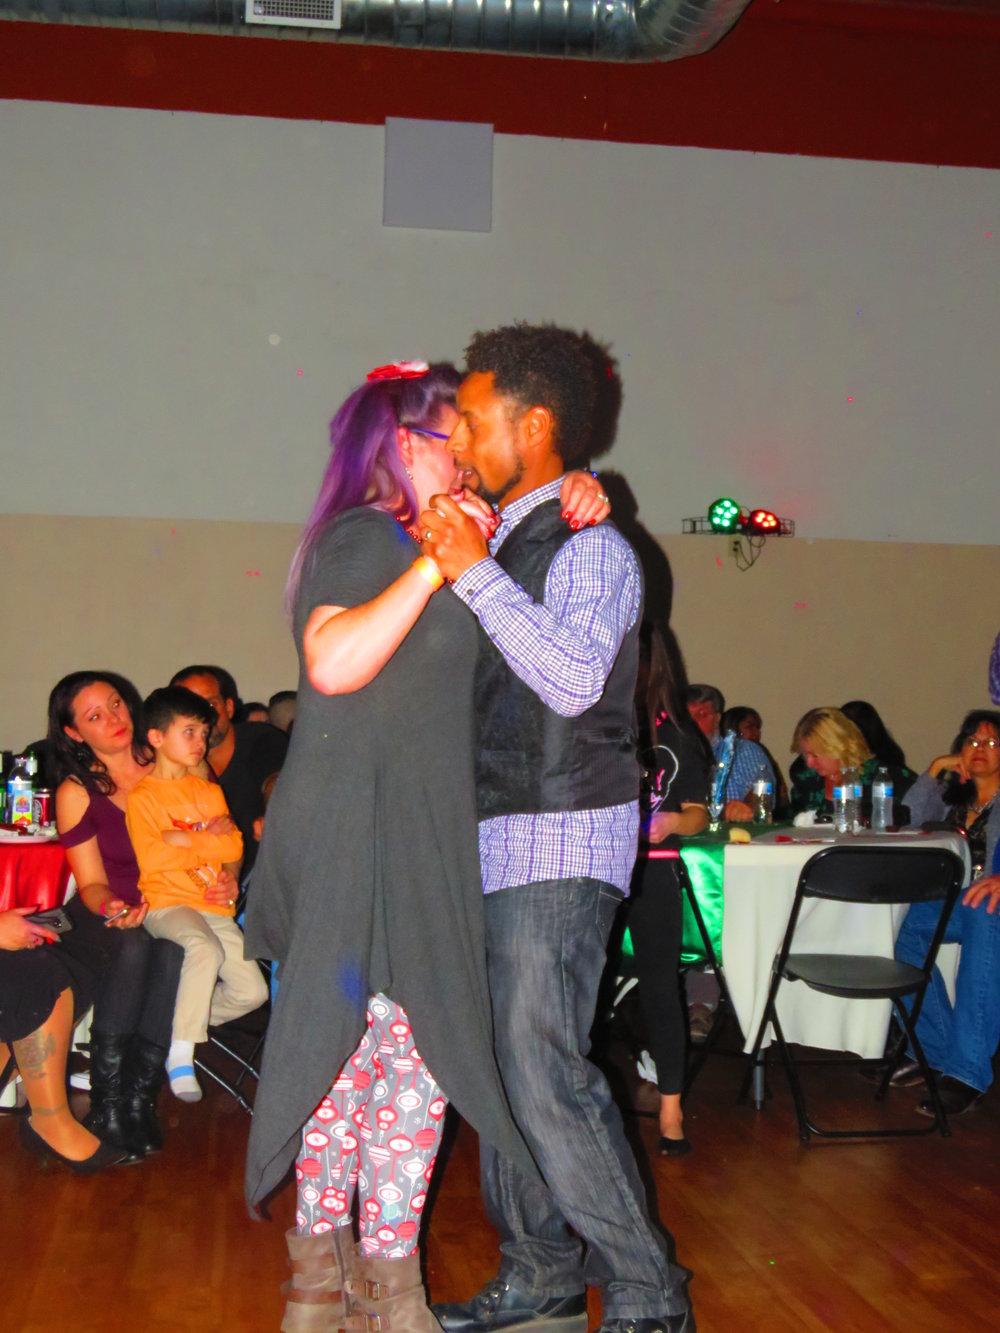 STACEY & BRIAN DANCING.JPG